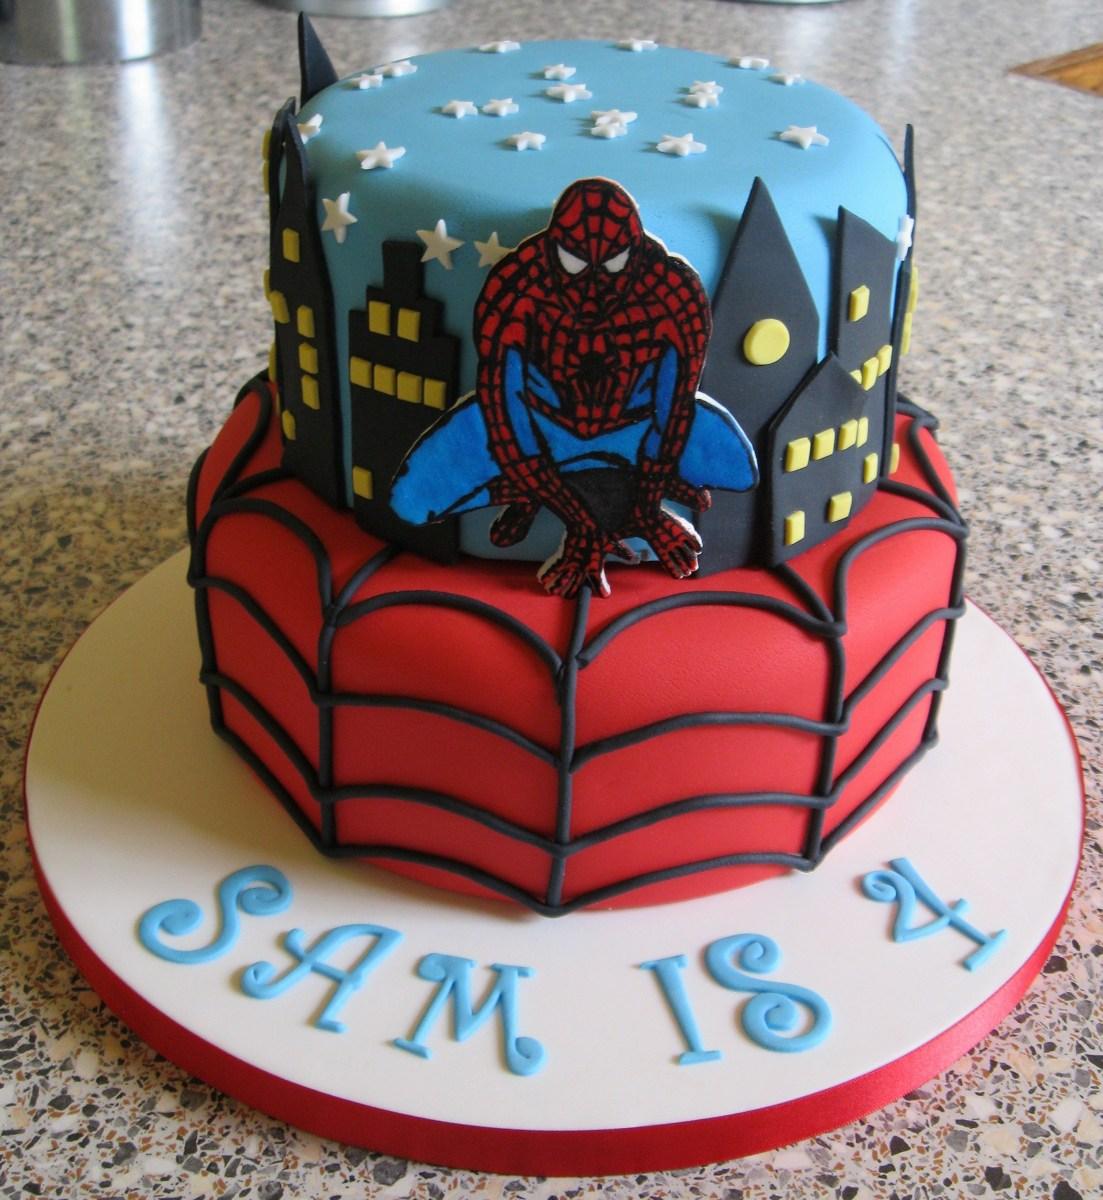 Spiderman Birthday Cakes Spiderman Birthday Cakes Best Spiderman Birthday Cakes Idea